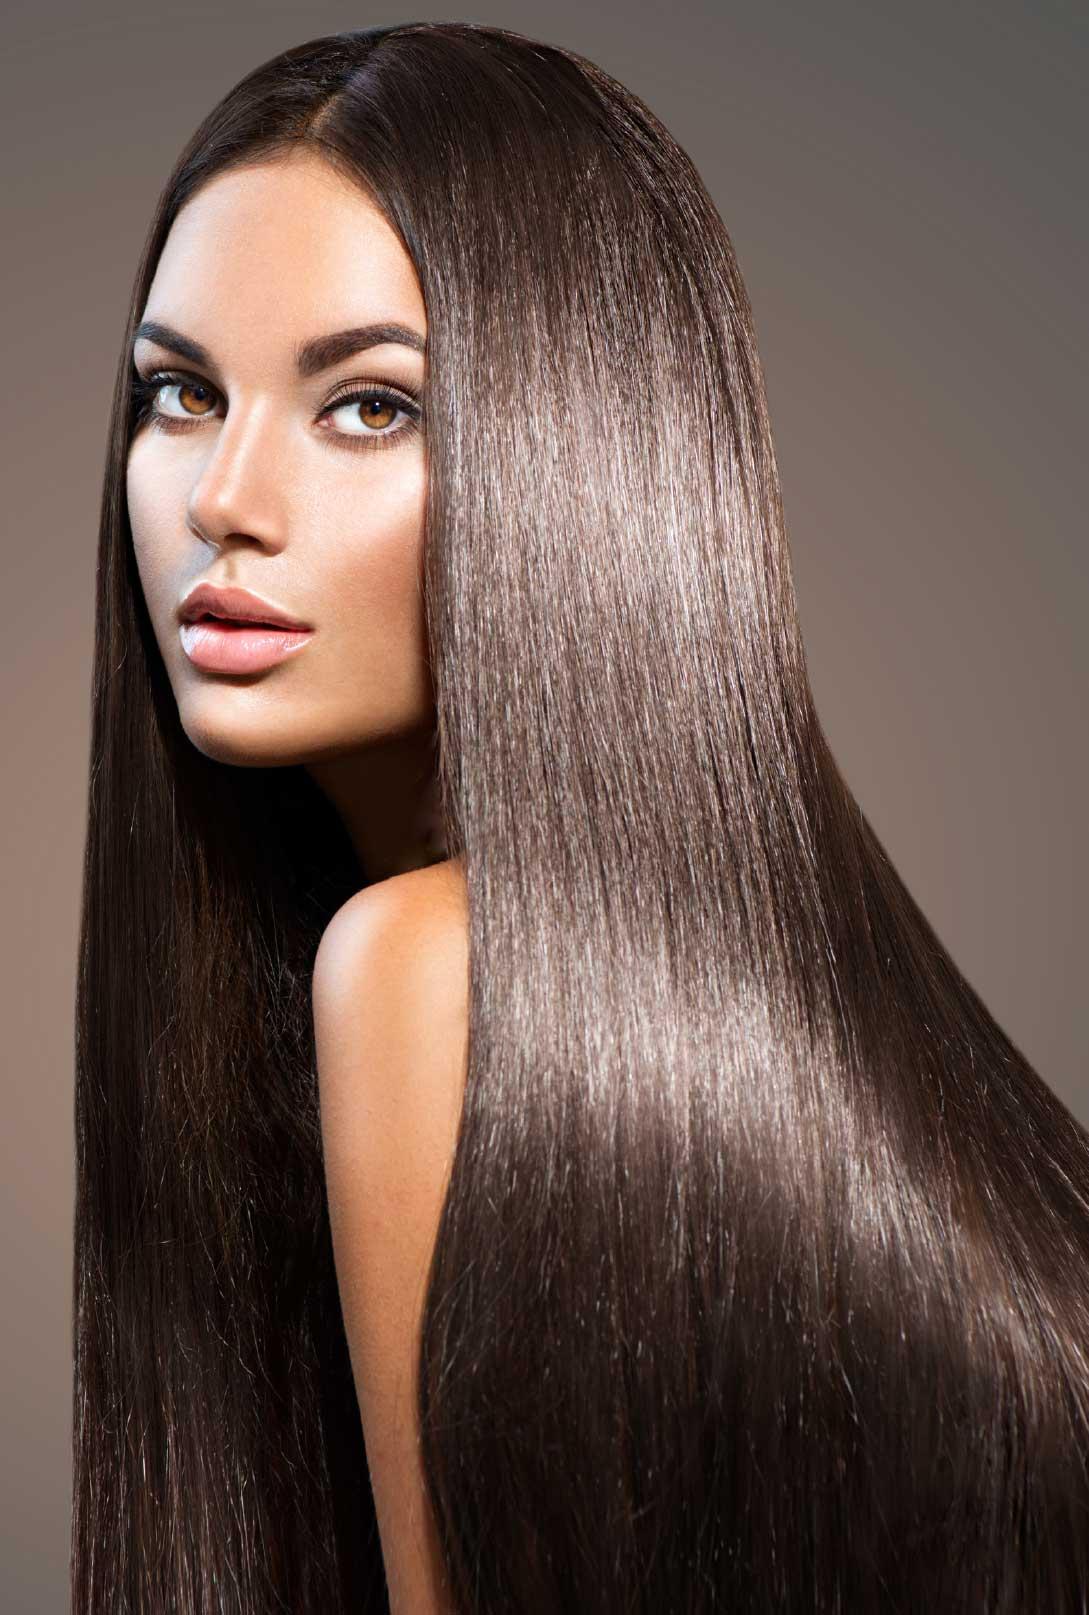 smeđa duga ravna kosa nakon tretmana Kosta hair proizvodima